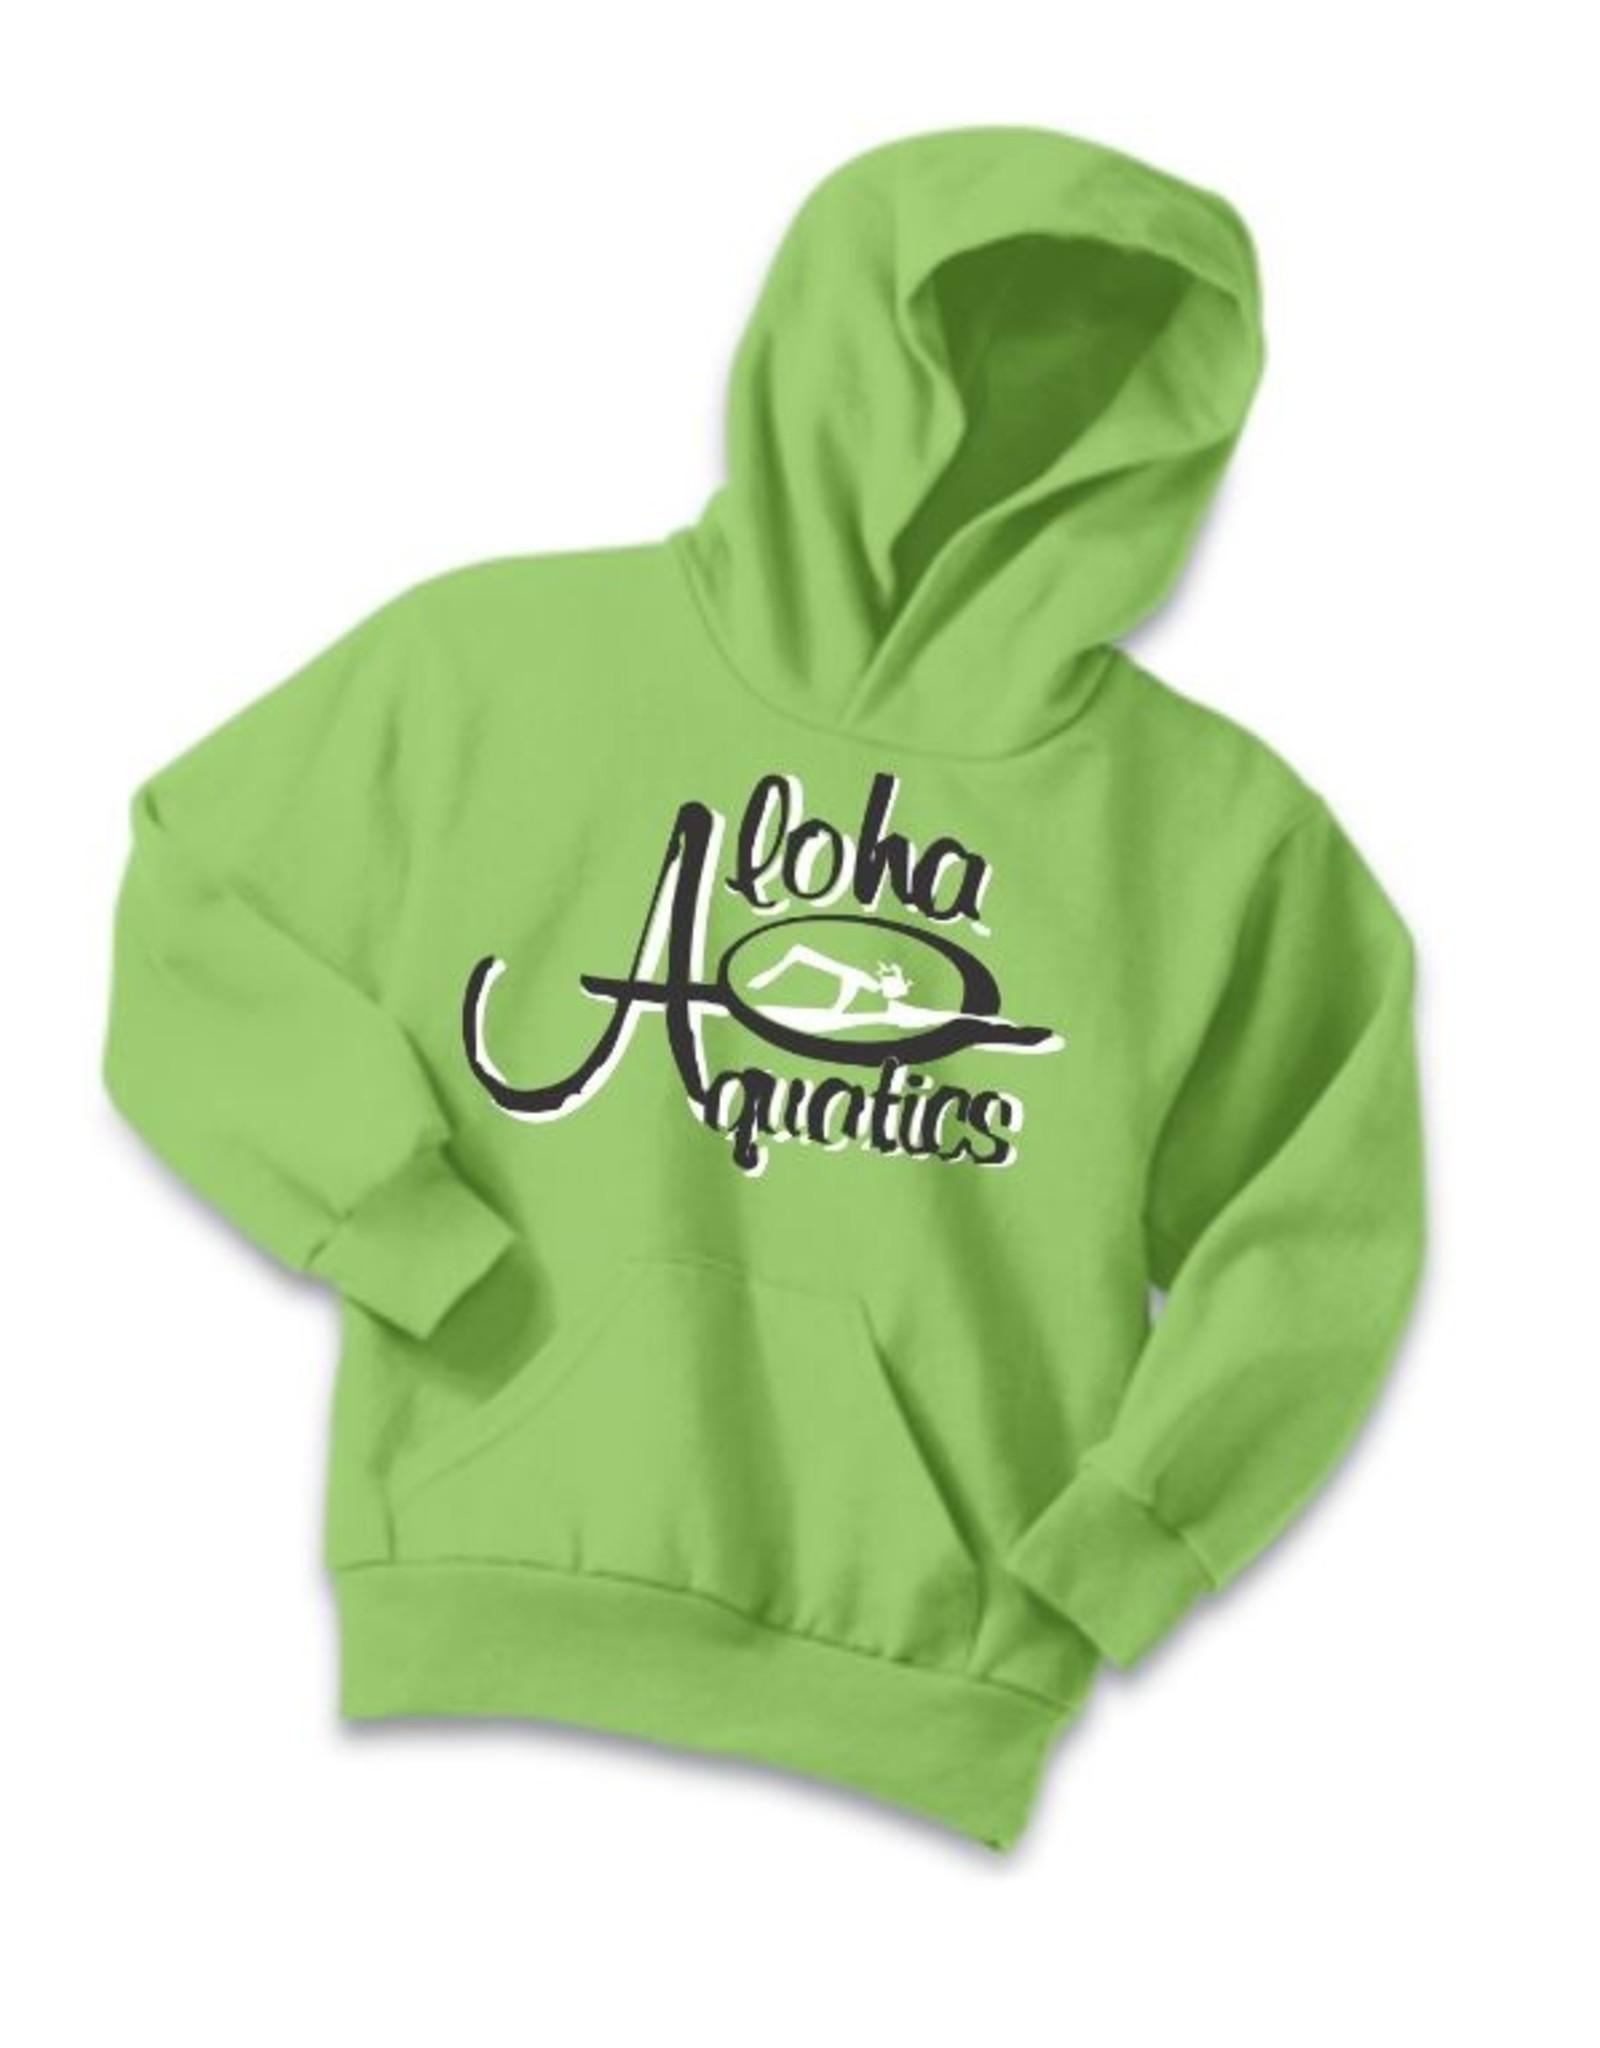 ALOHA AQUATICS TEAM HOODIE